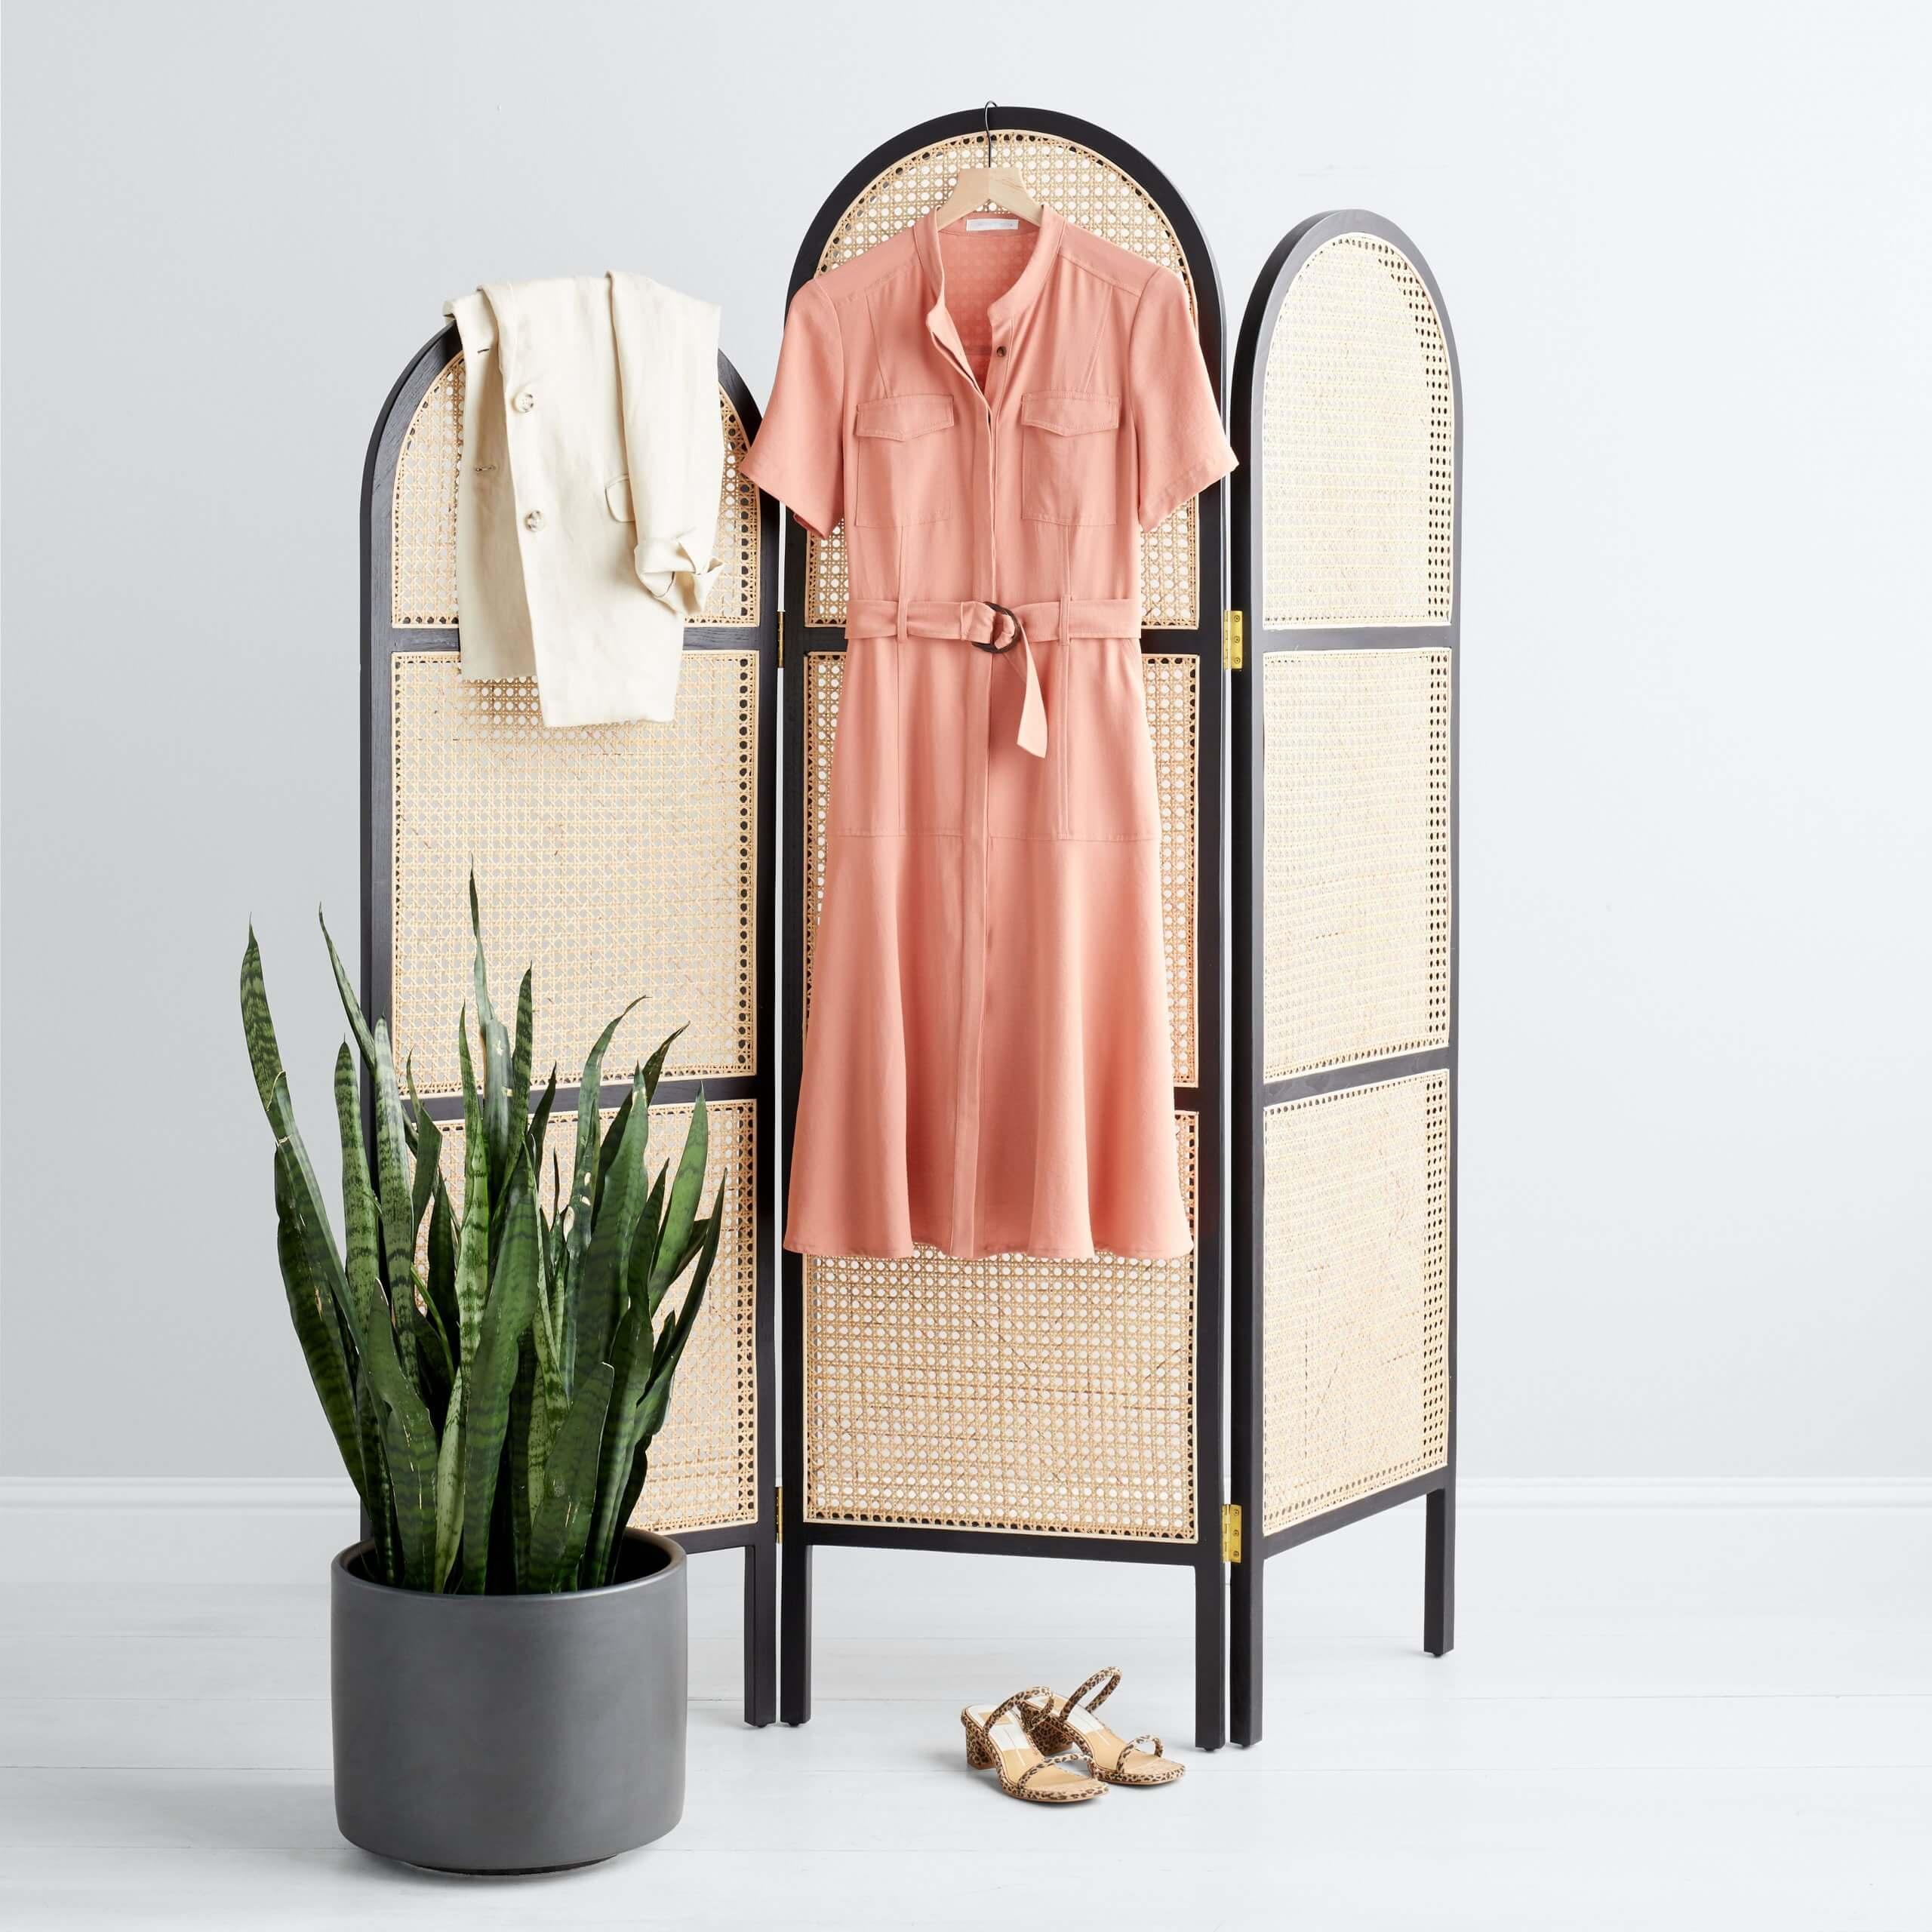 Stitch Fix Women's pink tie-waist shirt dress and cream blazer hanging on room divider with tan heels on the floor.